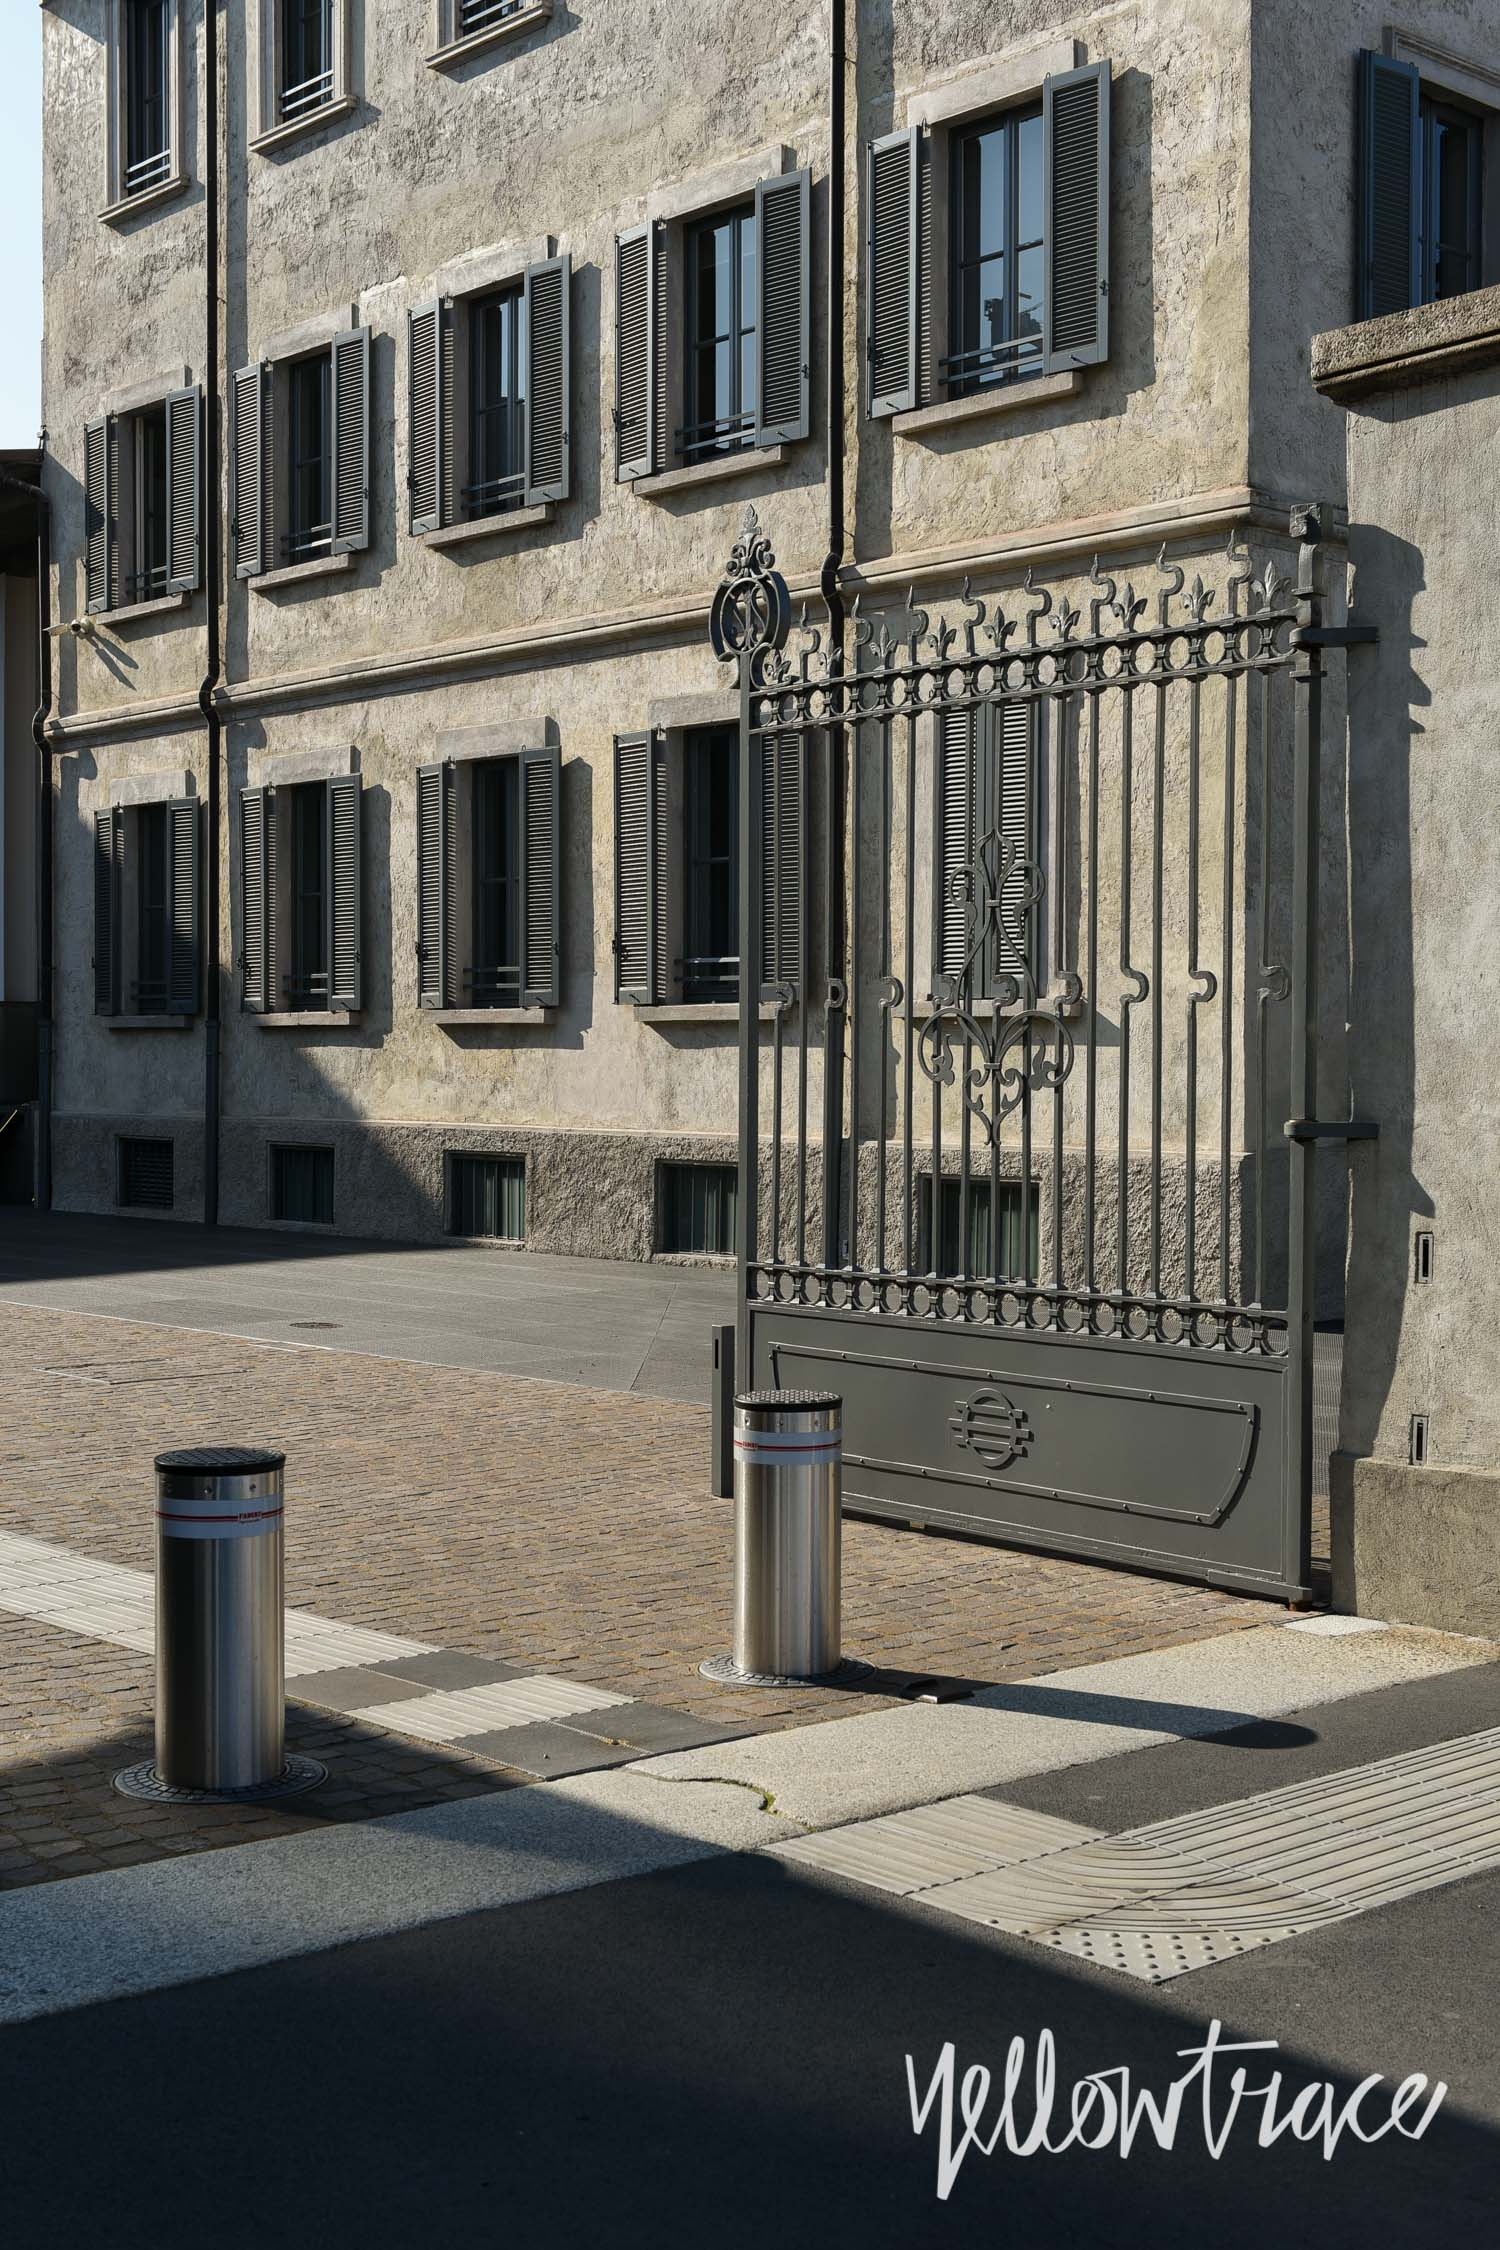 Milan Design Week 2017 Highlights, Fondazione Prada, Photo © Nick Hughes | #Milantrace2017